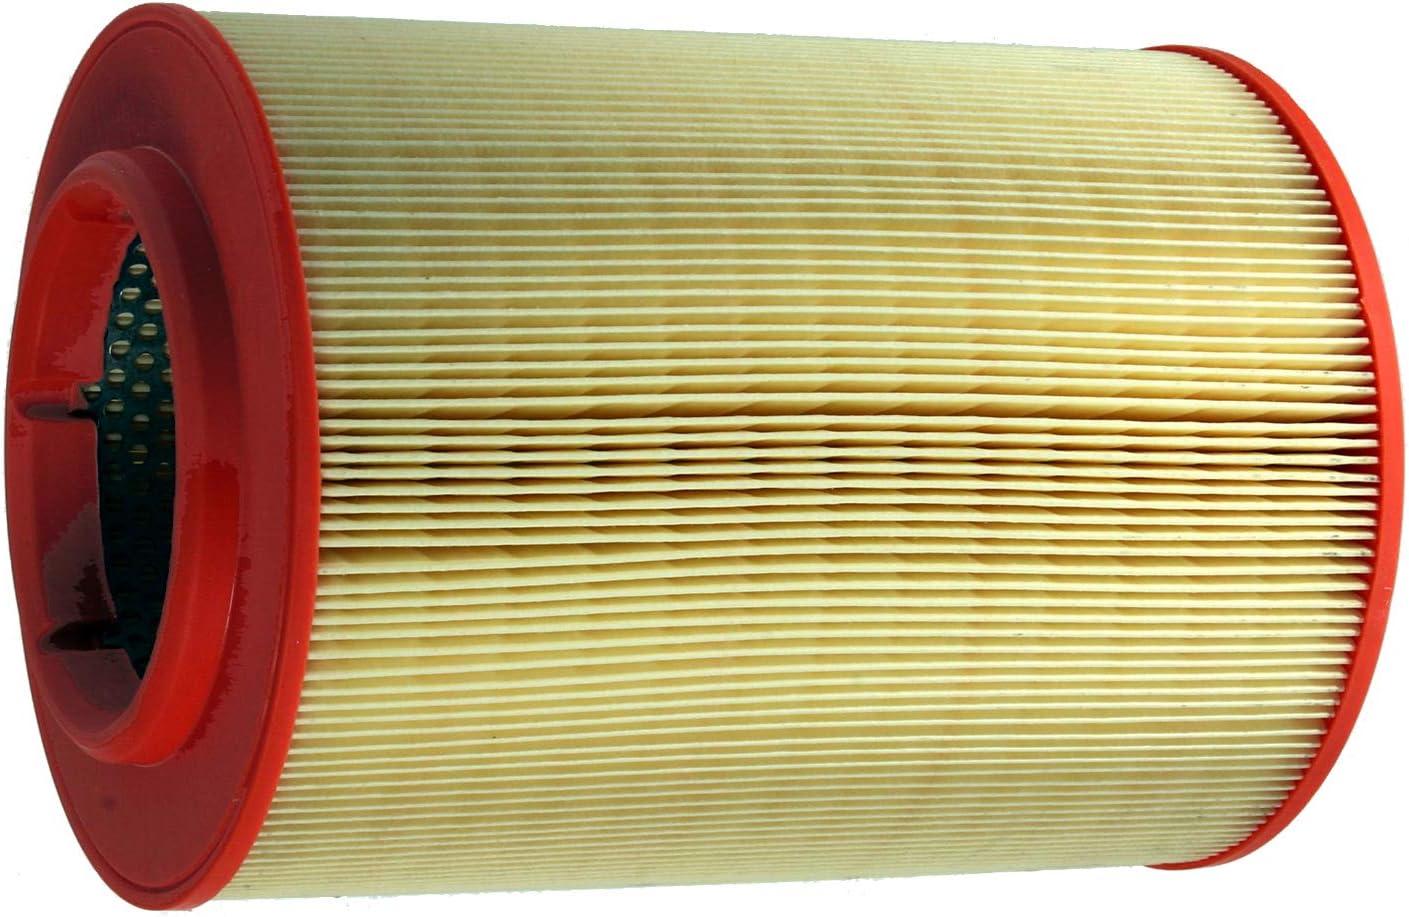 Febi Bilstein 21106 Air Filter Pack Of 1 Auto